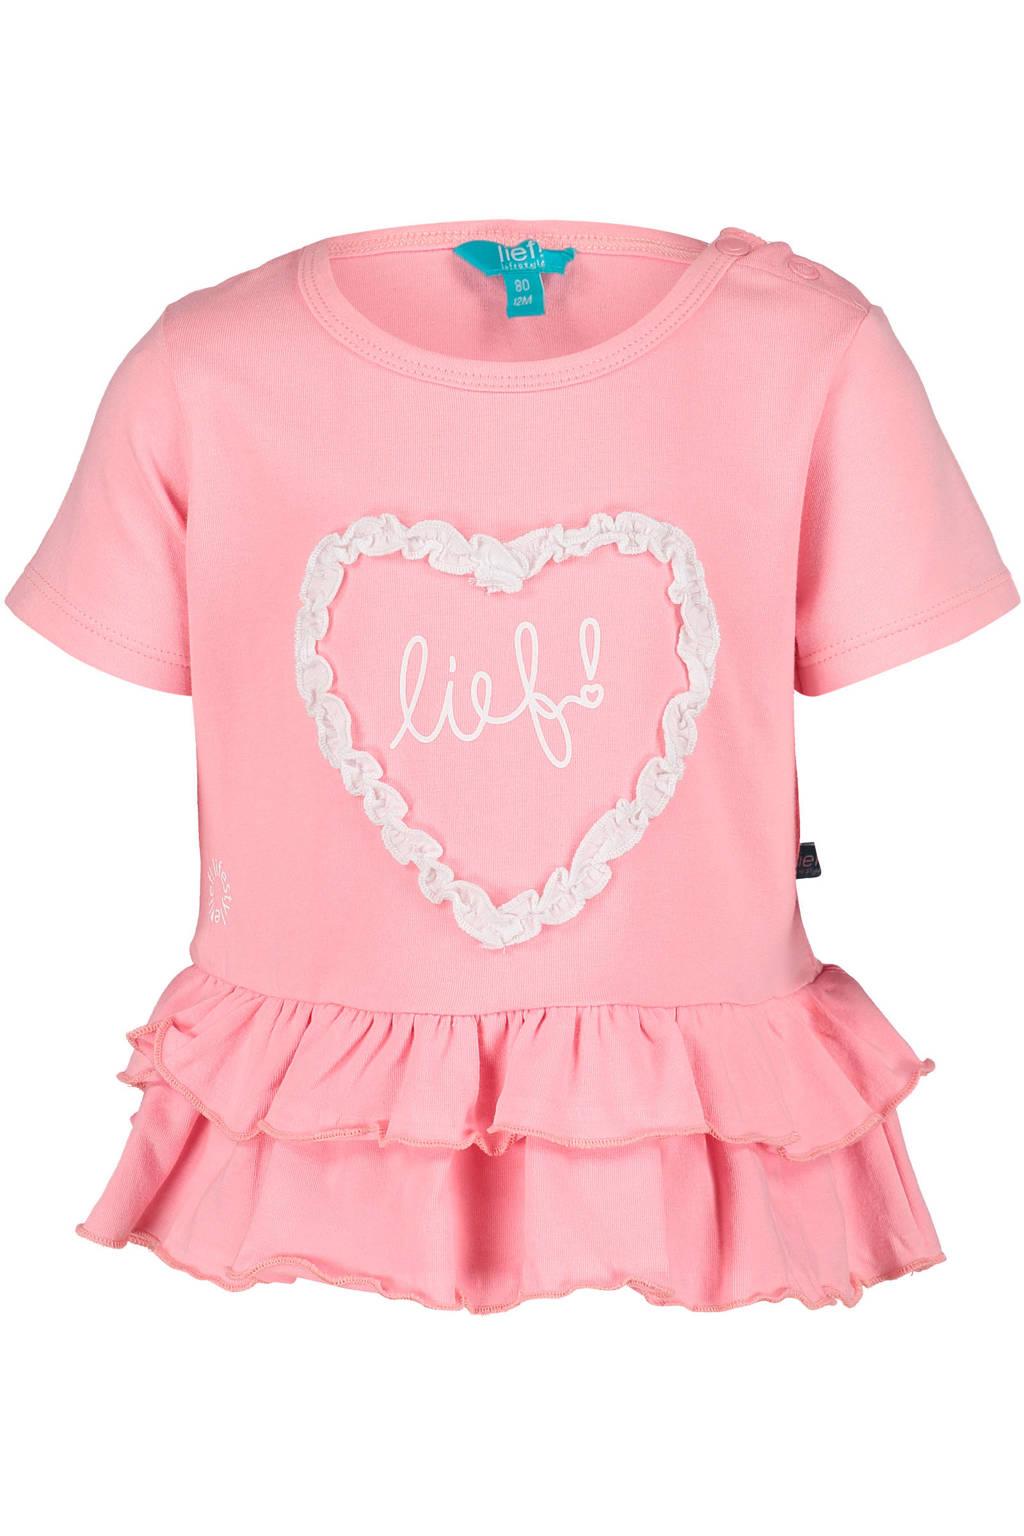 lief! regular fit T-shirt met printopdruk roze, Roze